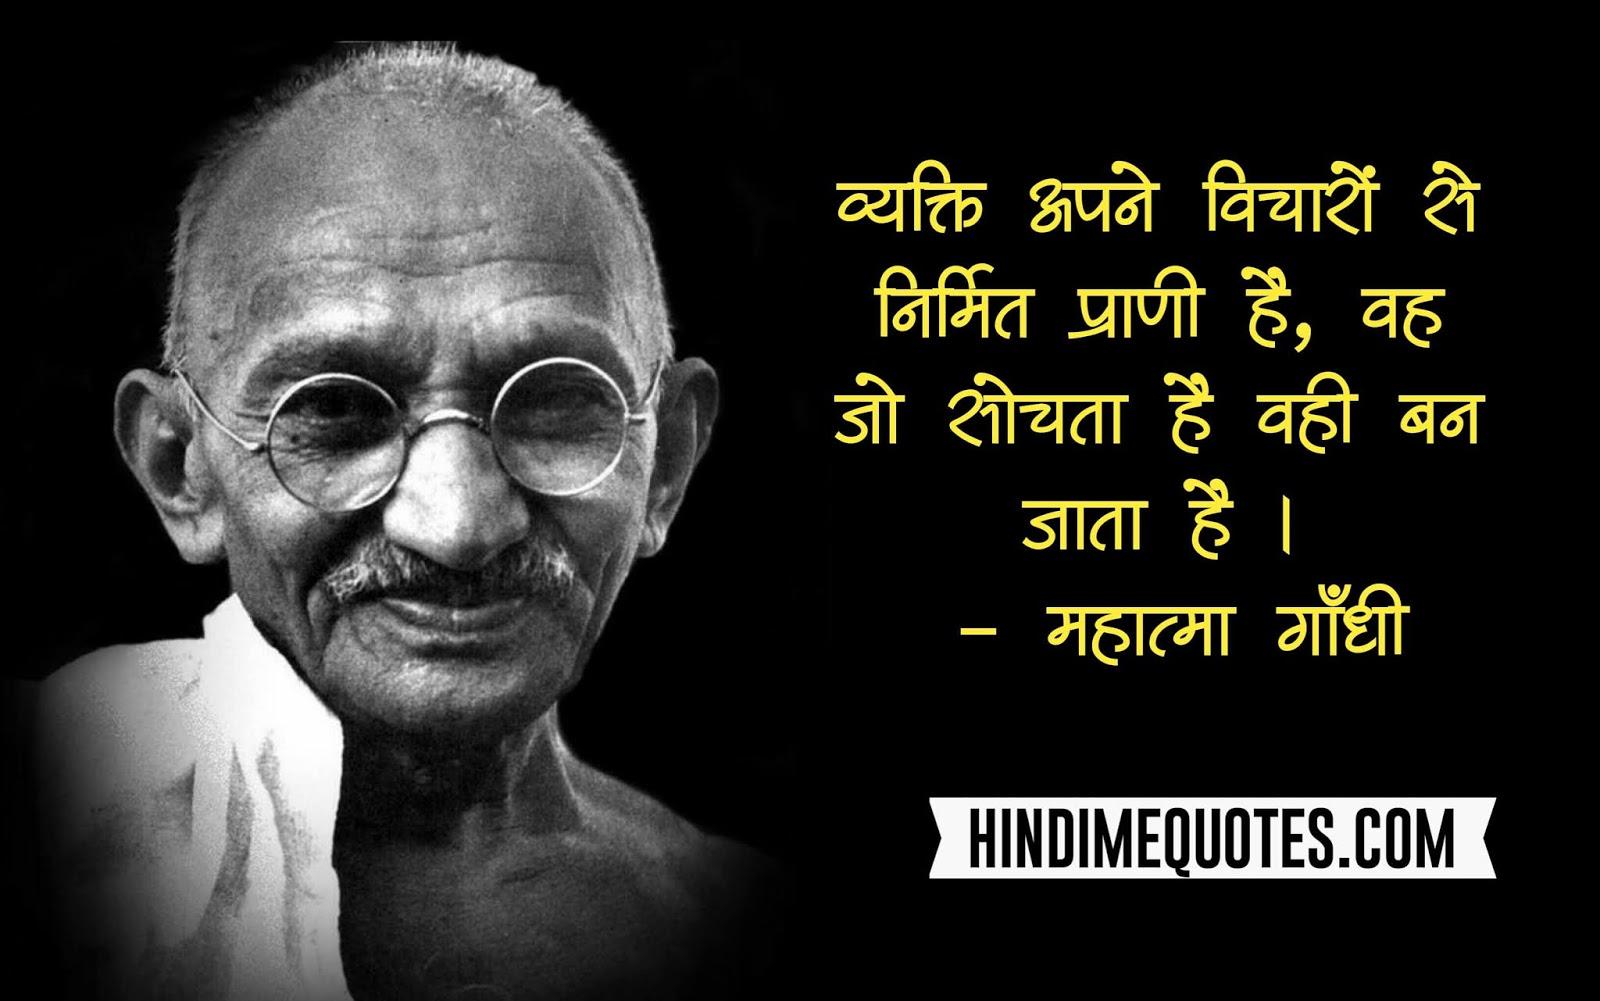 Gandhi-jayanti-quotes-in-hindi